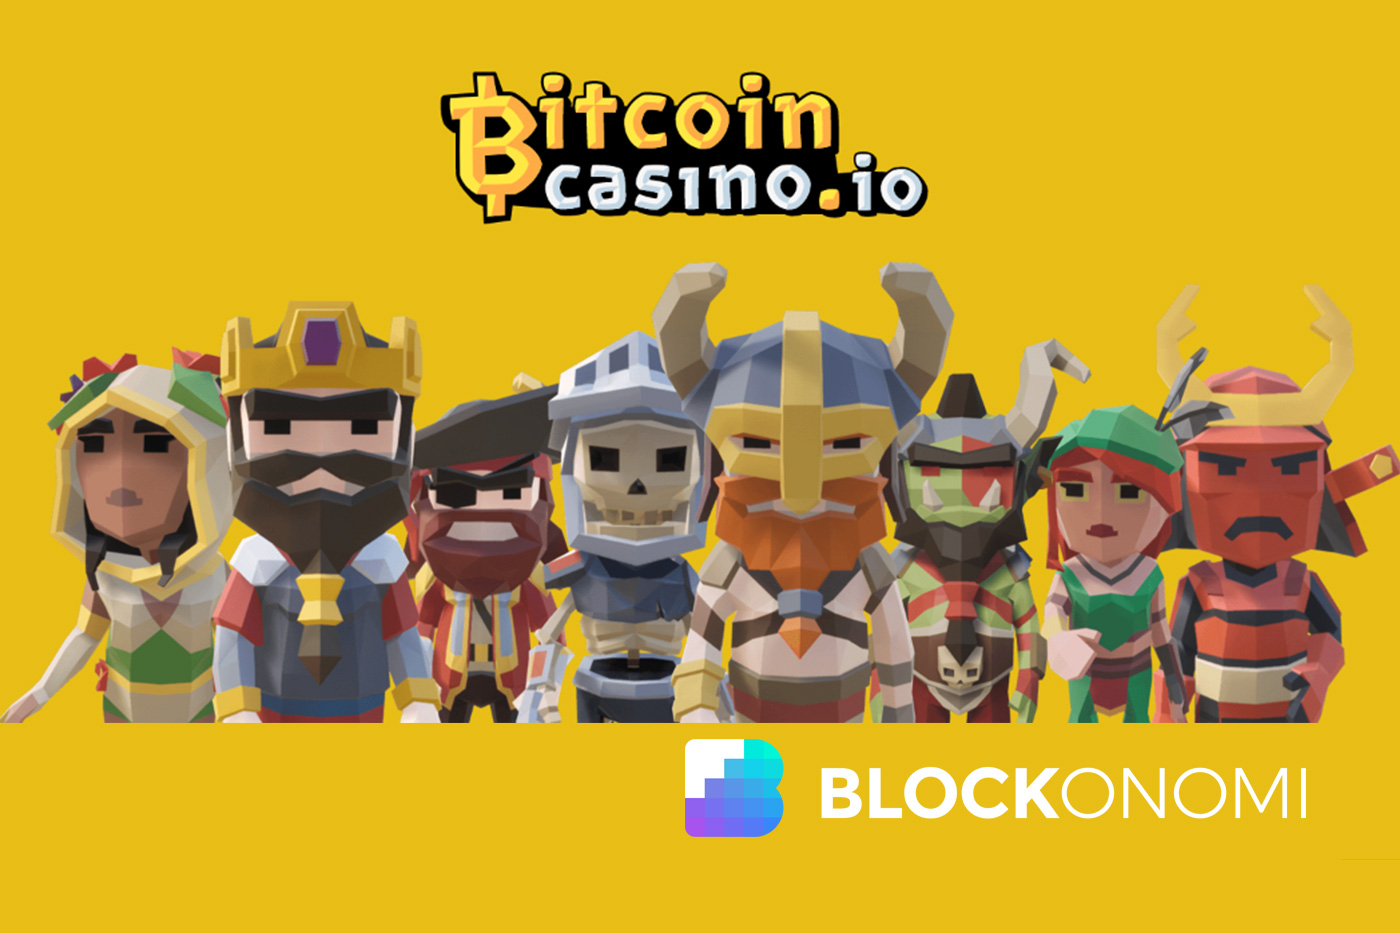 Bitcoin casino moons no deposit sign up bonus